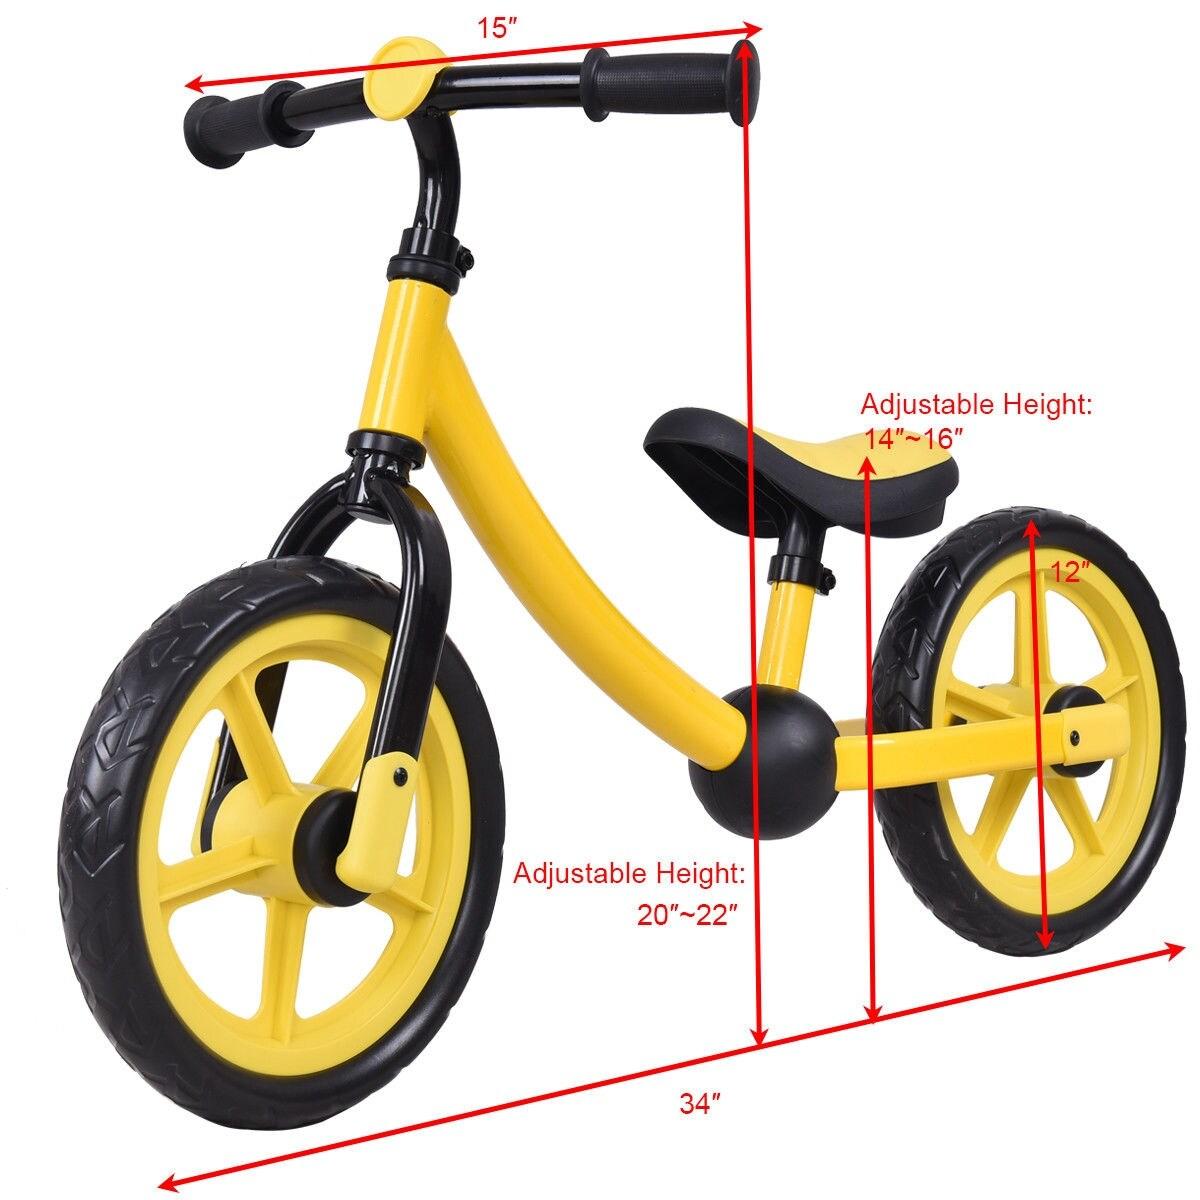 12 Kids Sport Balance Bike No Pedal Ride Pre Bike W Adjustable